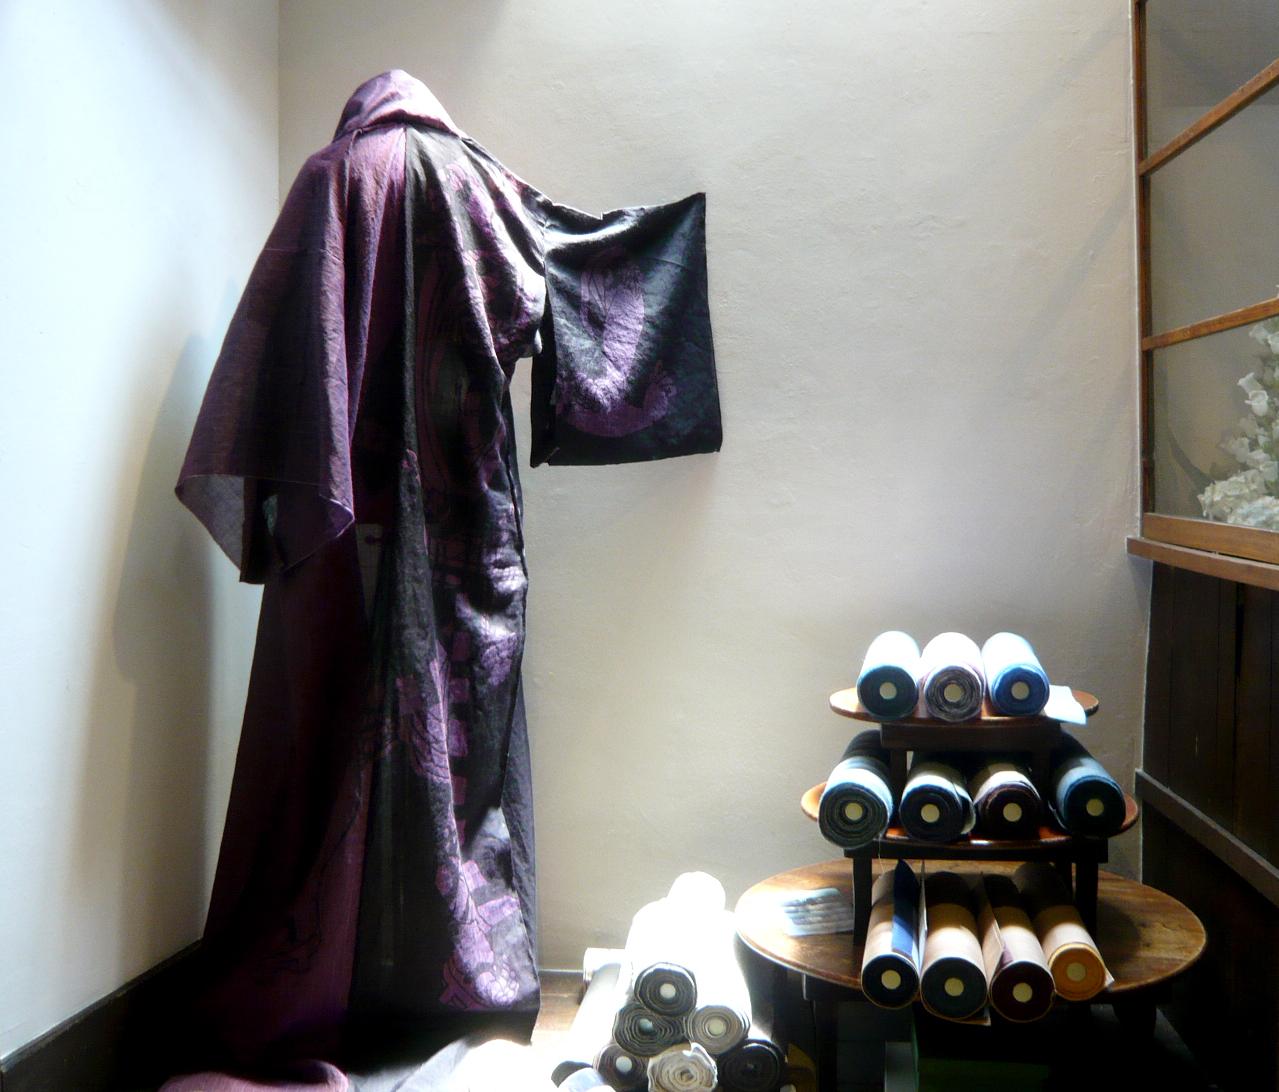 Eba Kimono displayed. All photos©Yasuhiko Sunahara